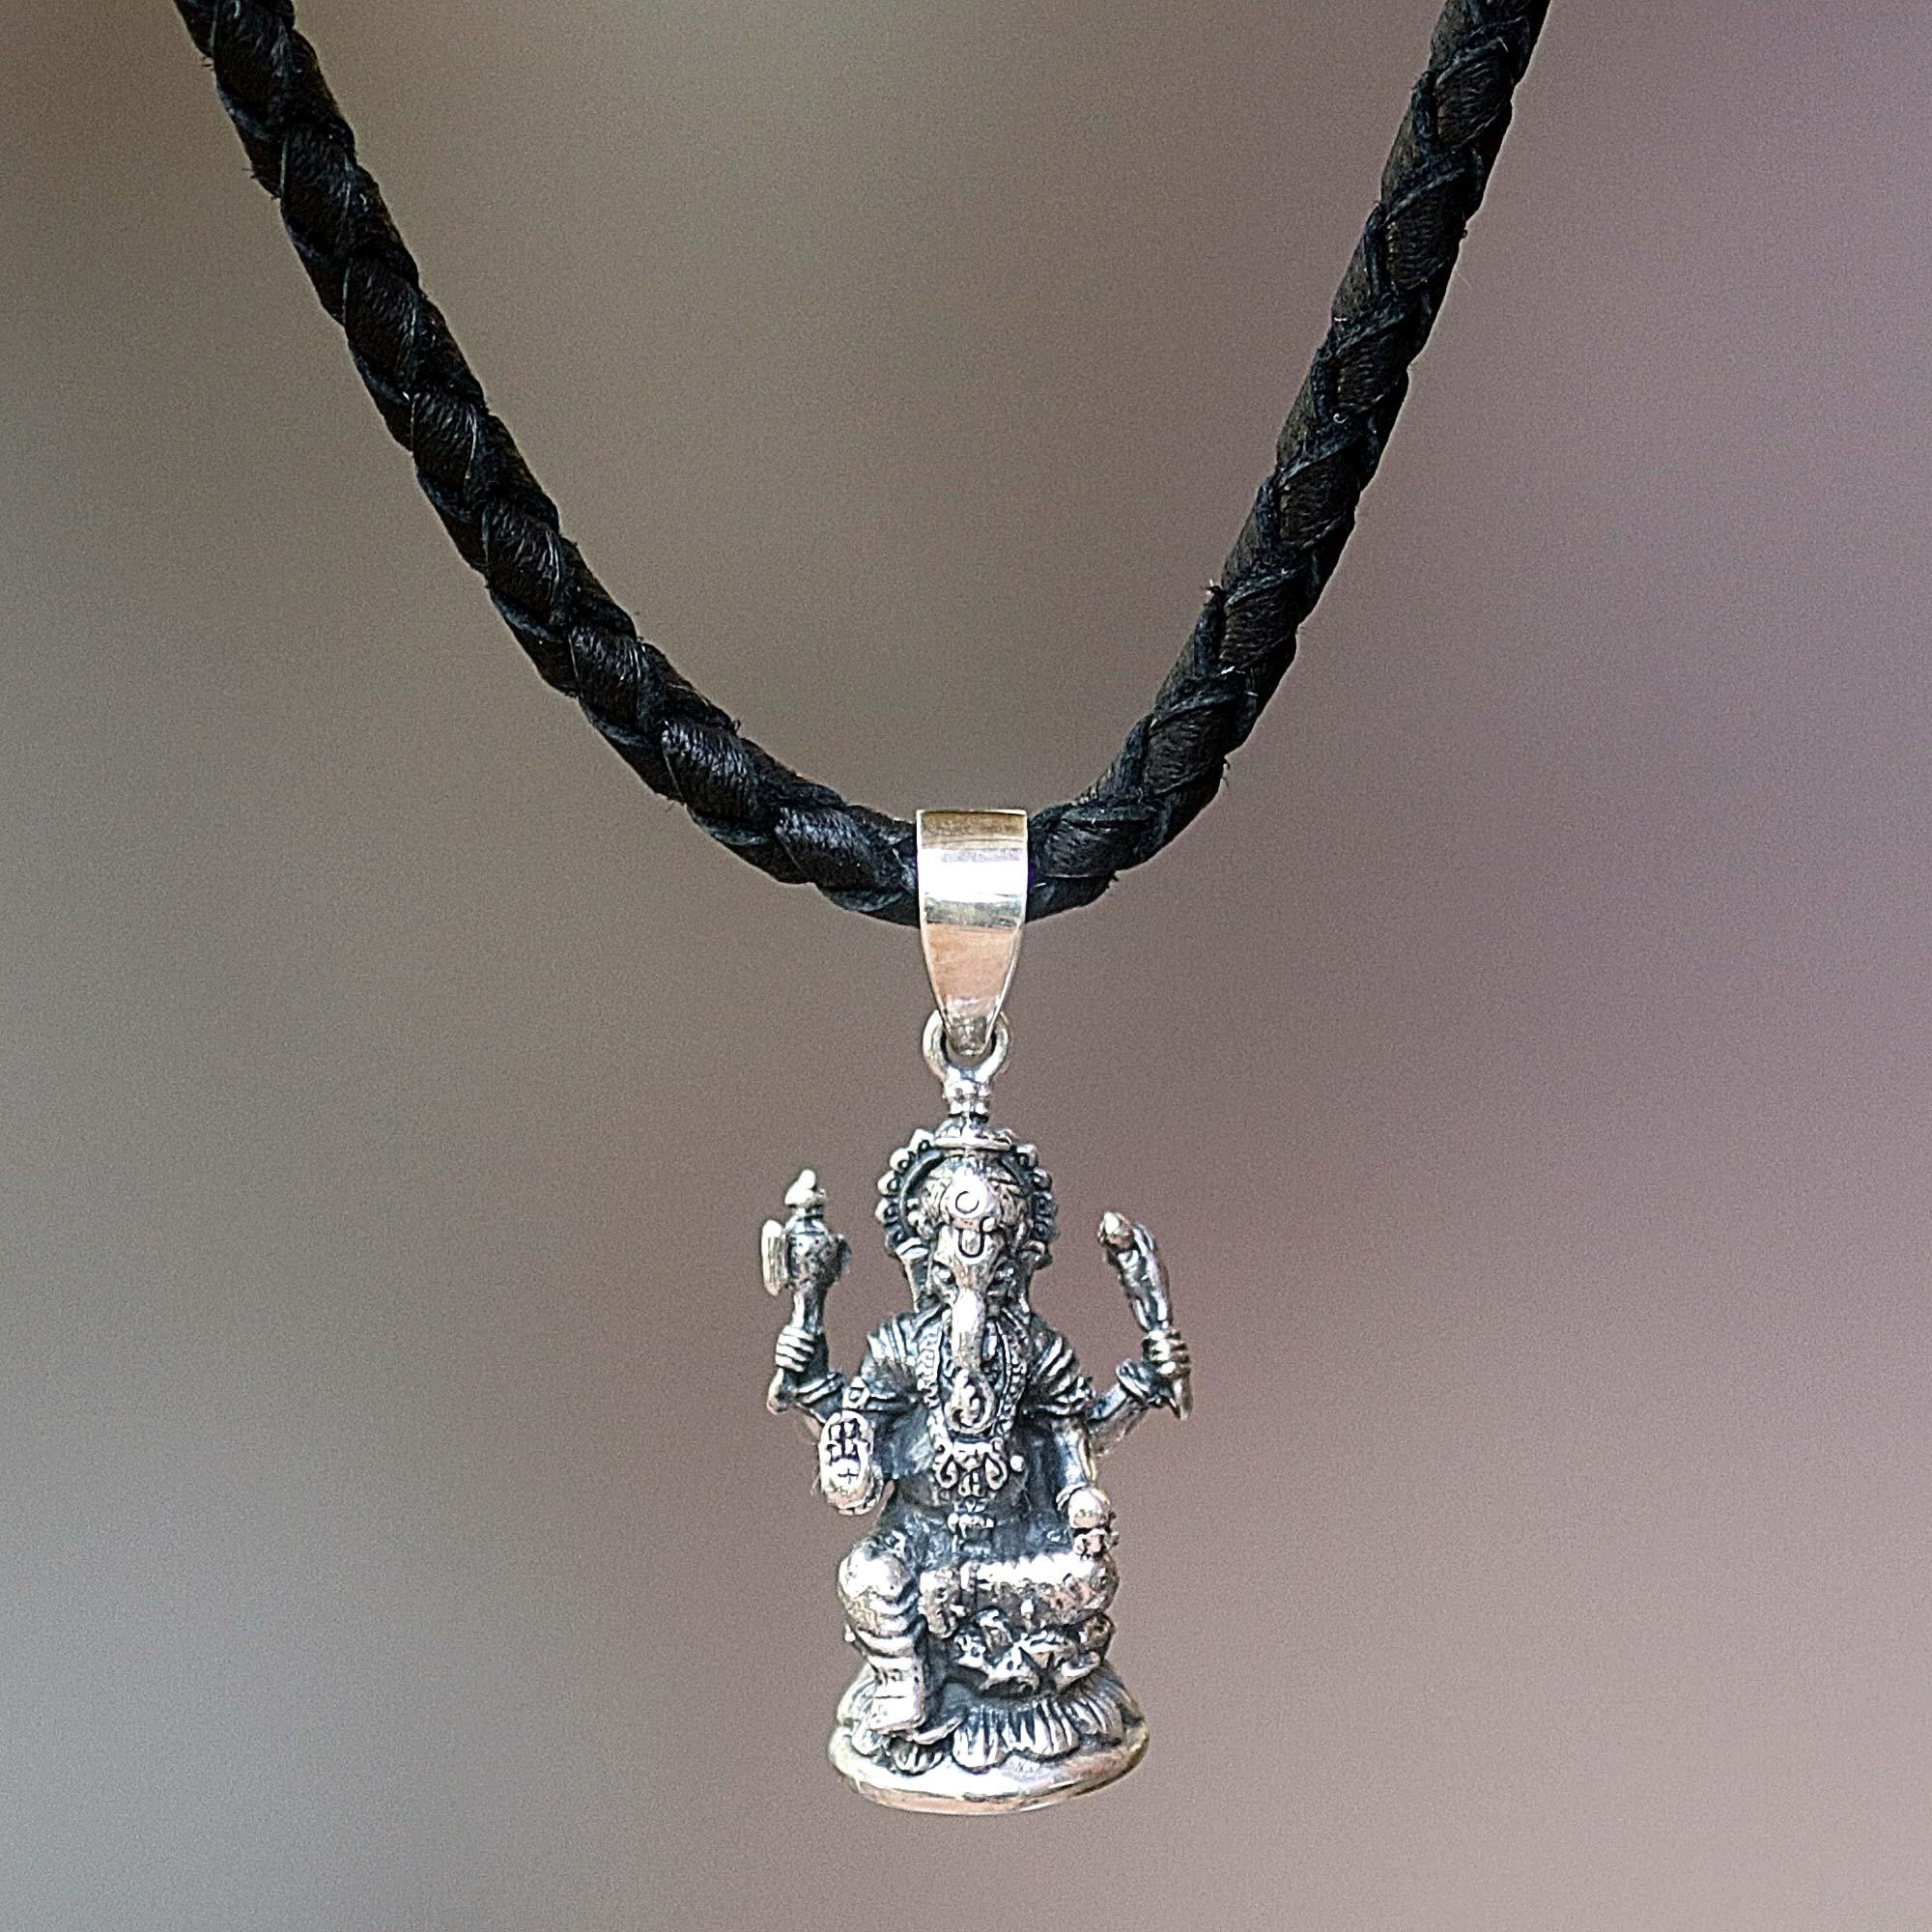 4e1154ab4 Unicef UK Market | Men's Sterling Silver Pendant Necklace - Ganesha